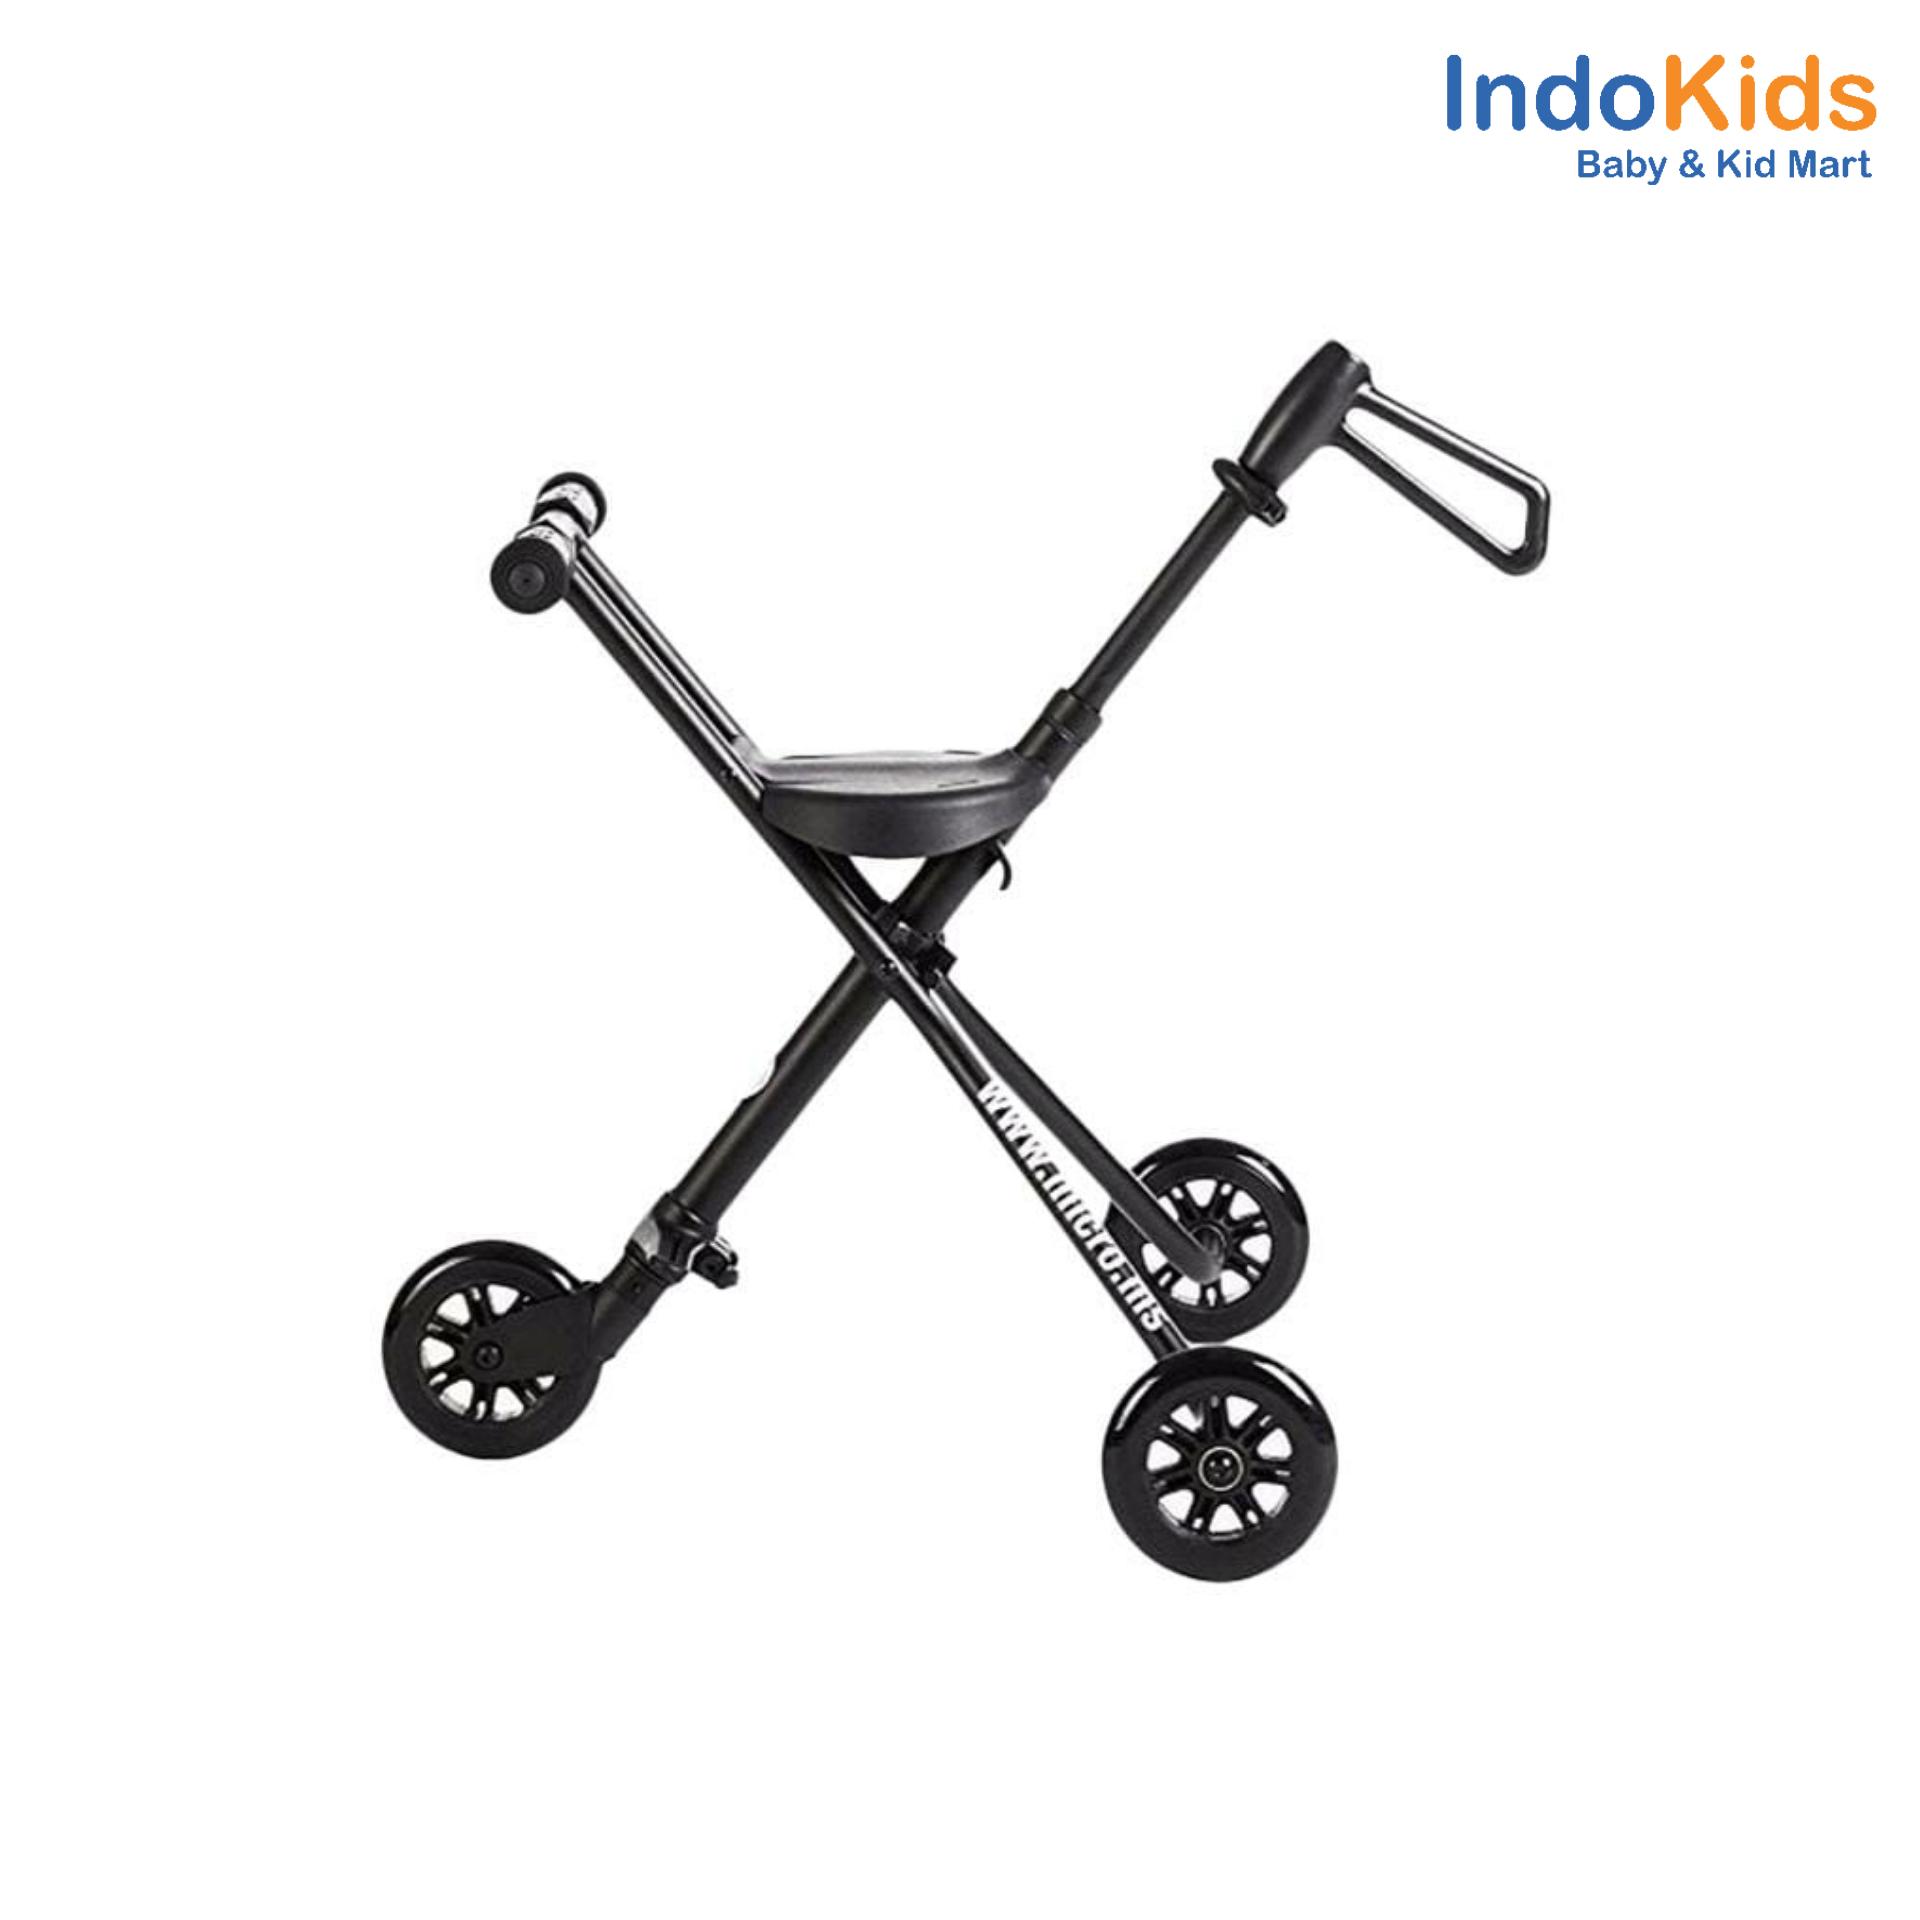 Micro Trike Deluxe - Mini Stroller